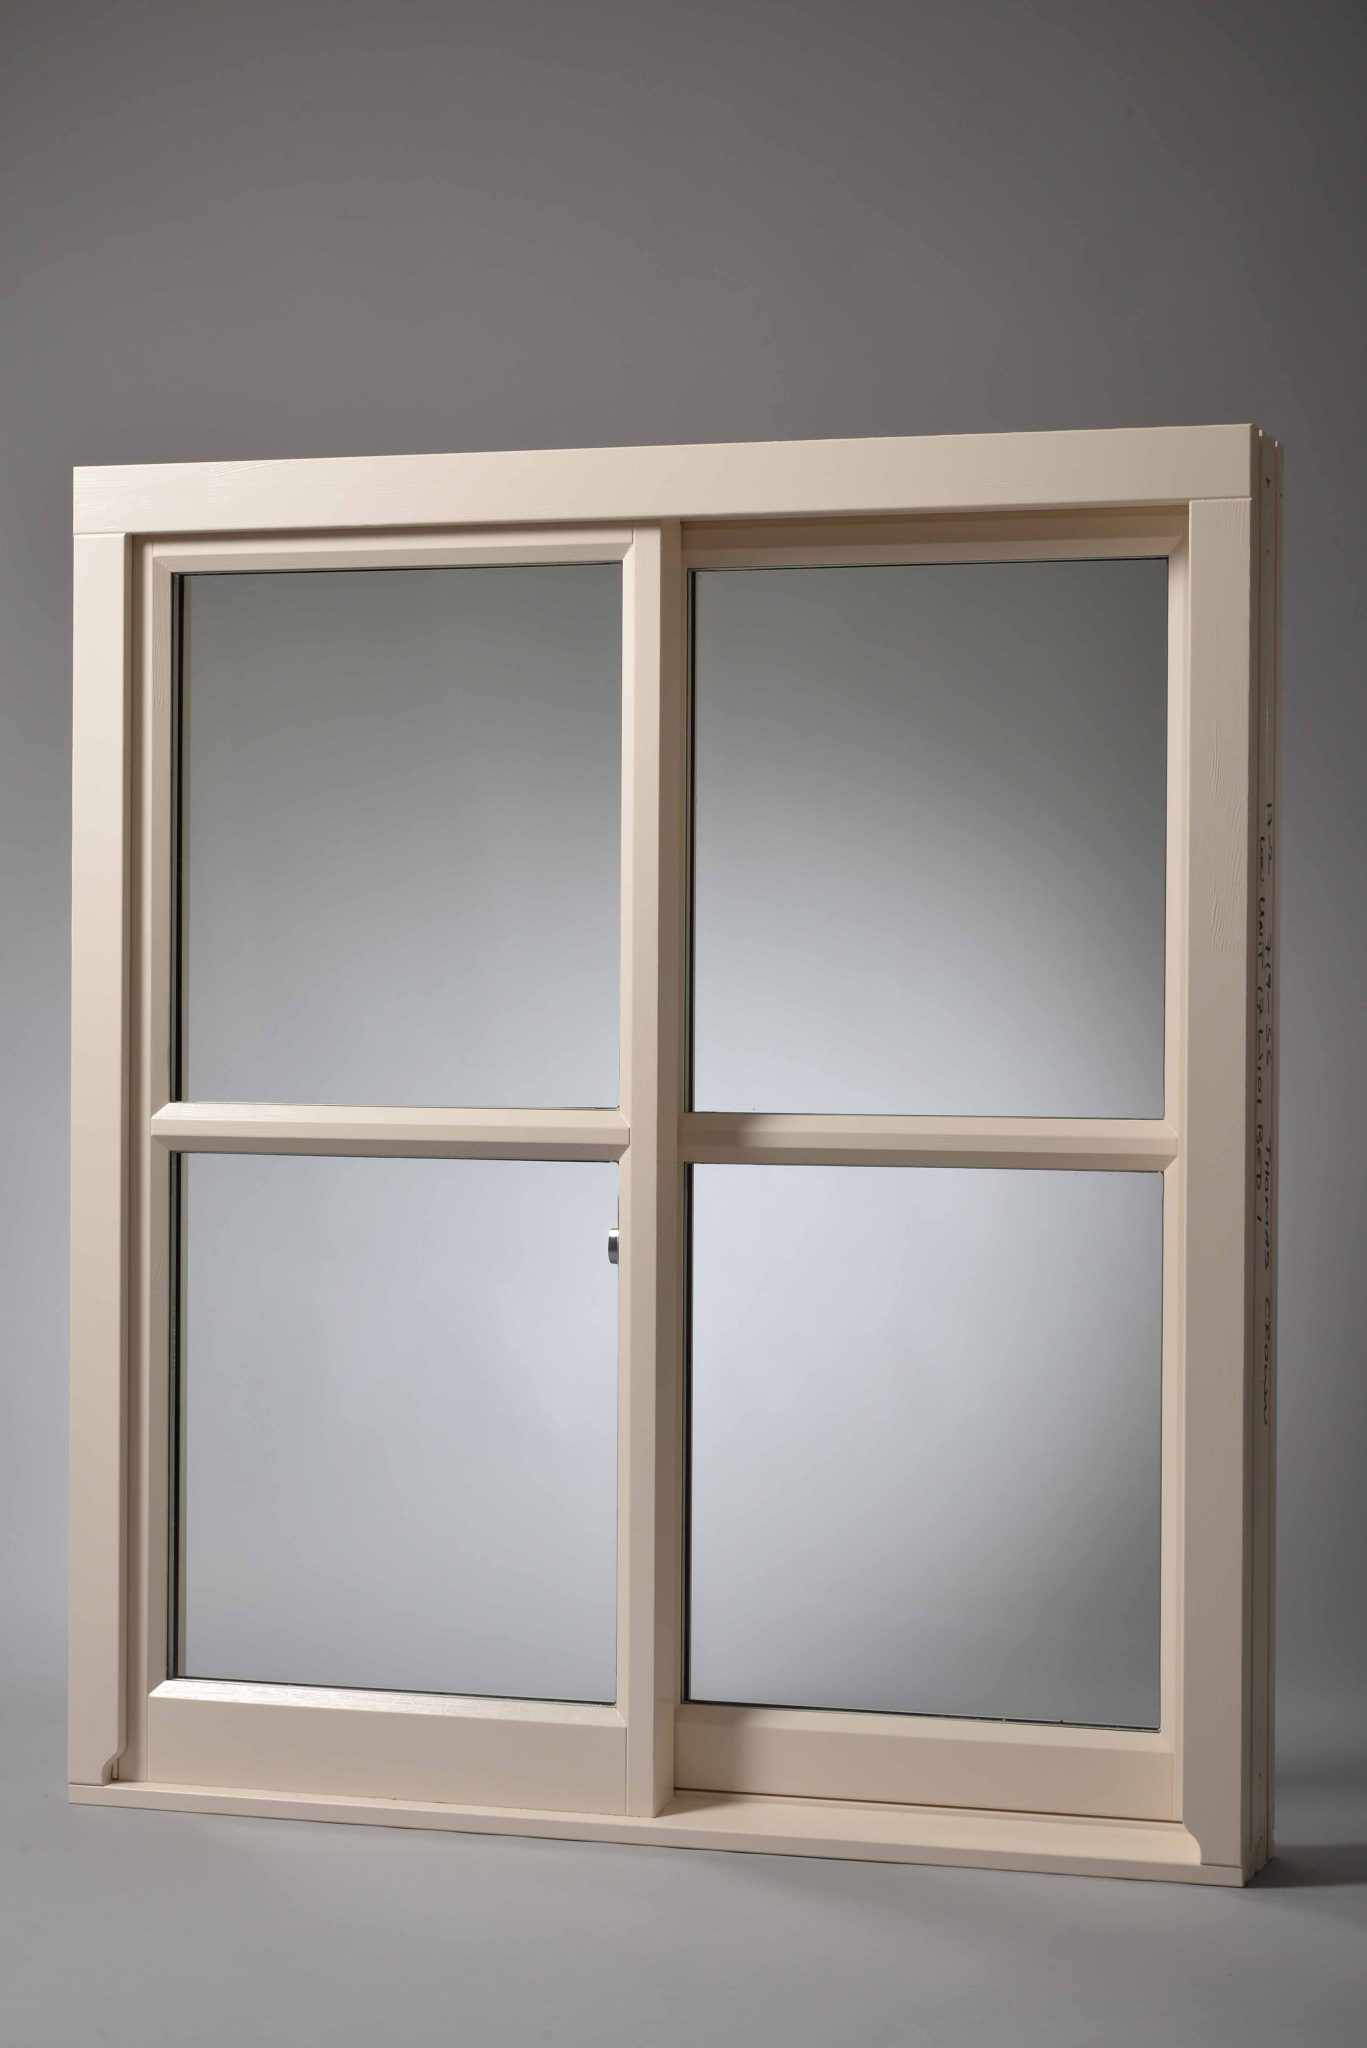 Timber yorkshire sash windows for Window sash design